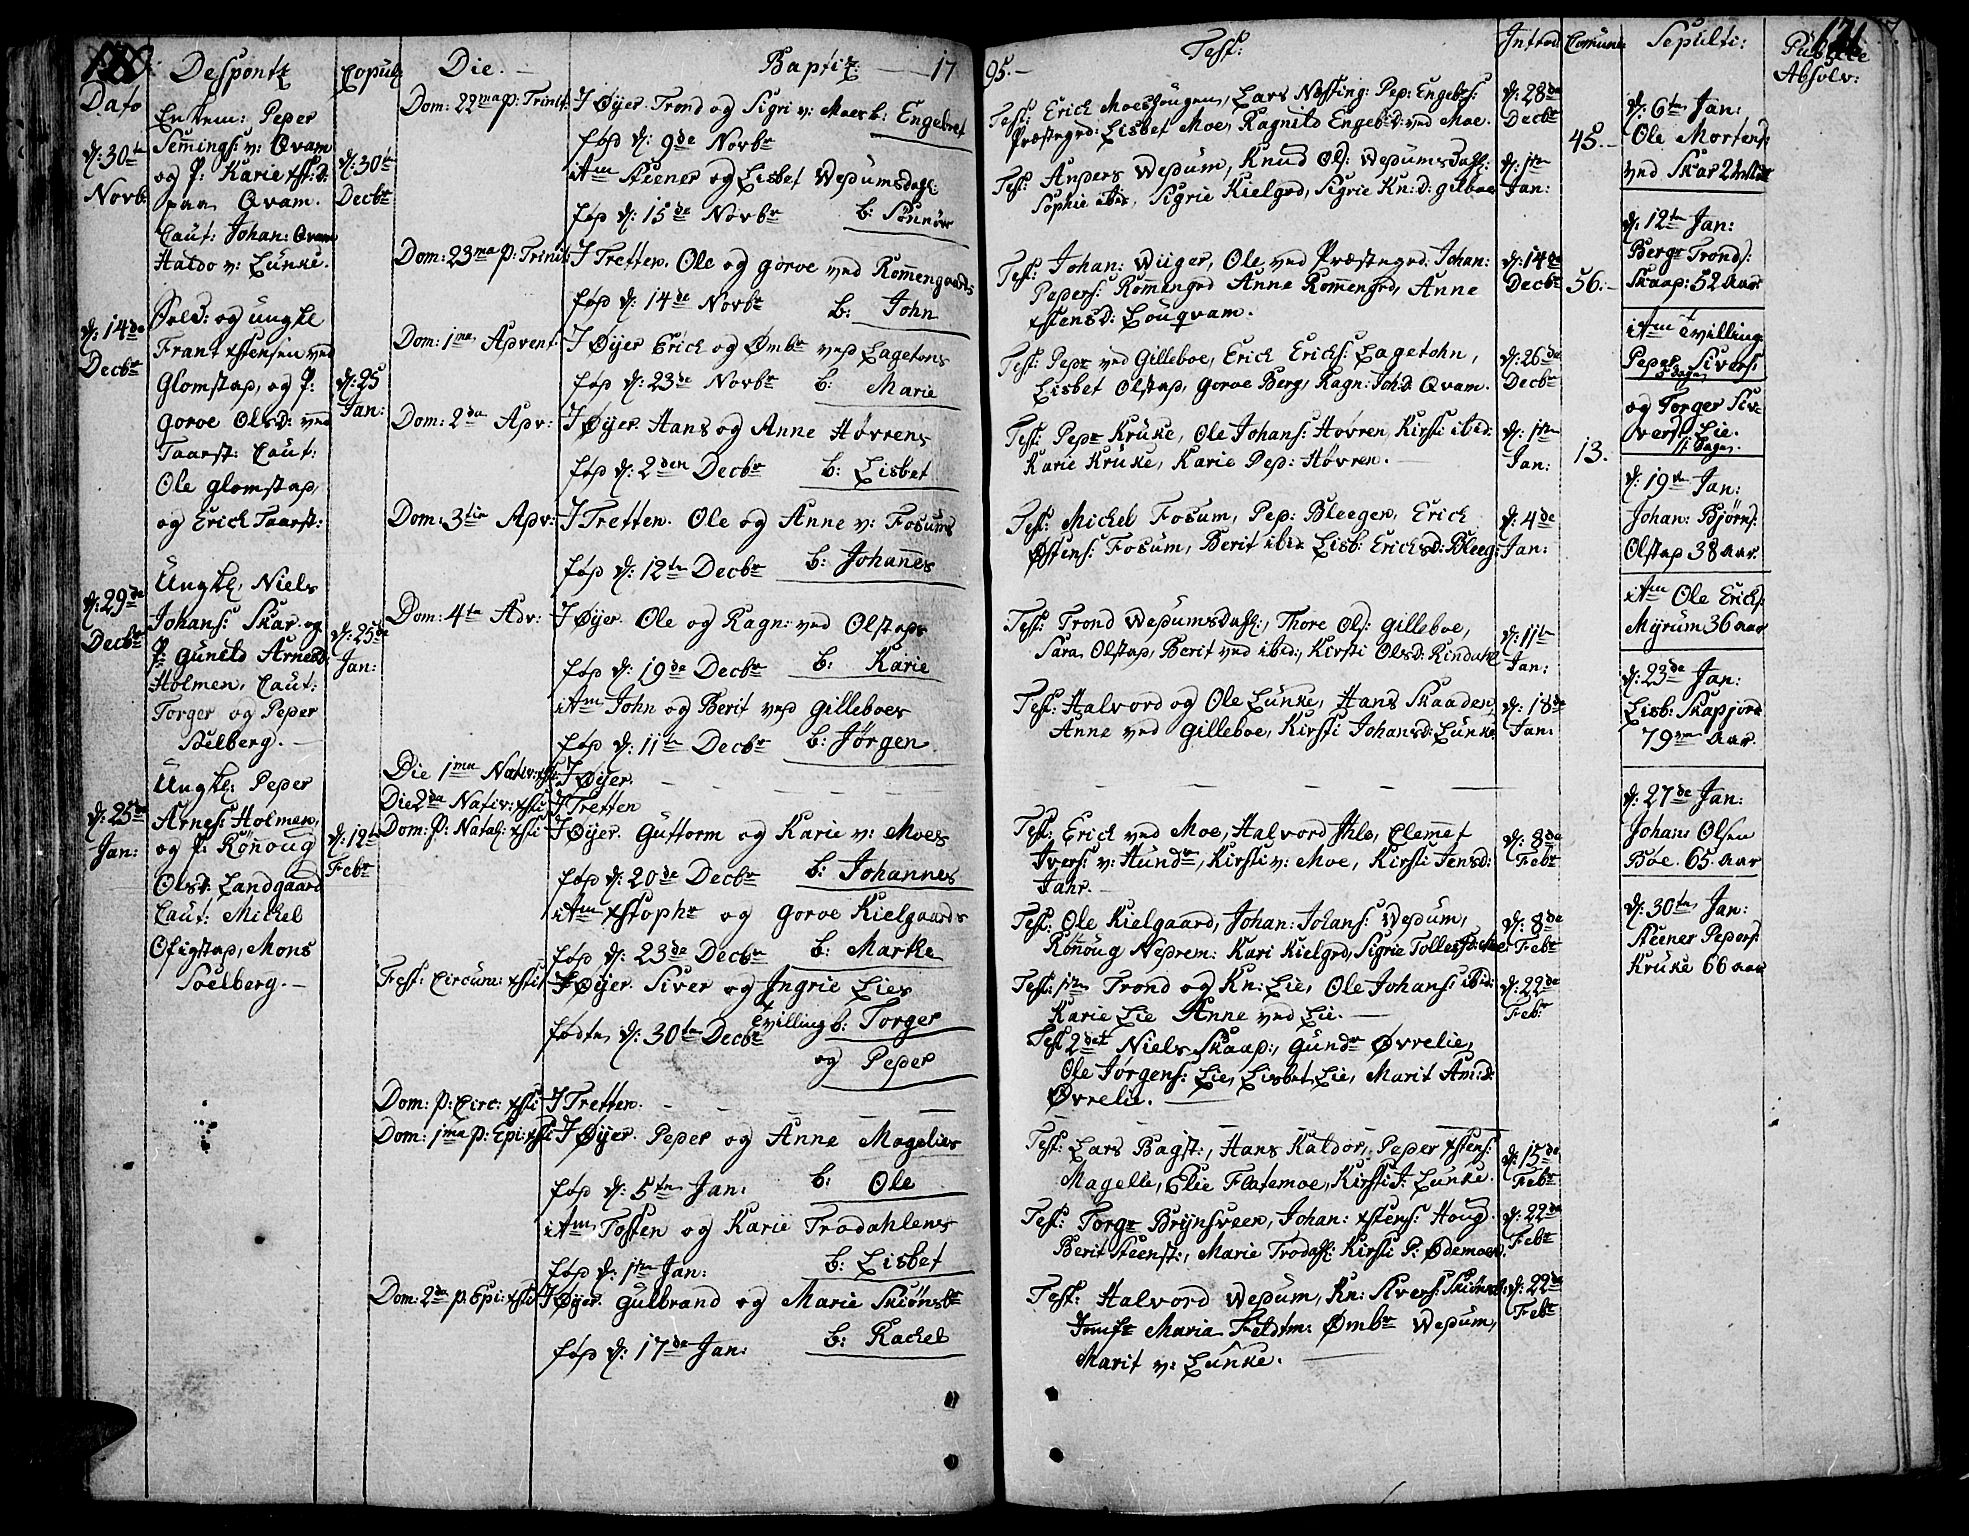 SAH, Øyer prestekontor, Ministerialbok nr. 3, 1784-1824, s. 120-121